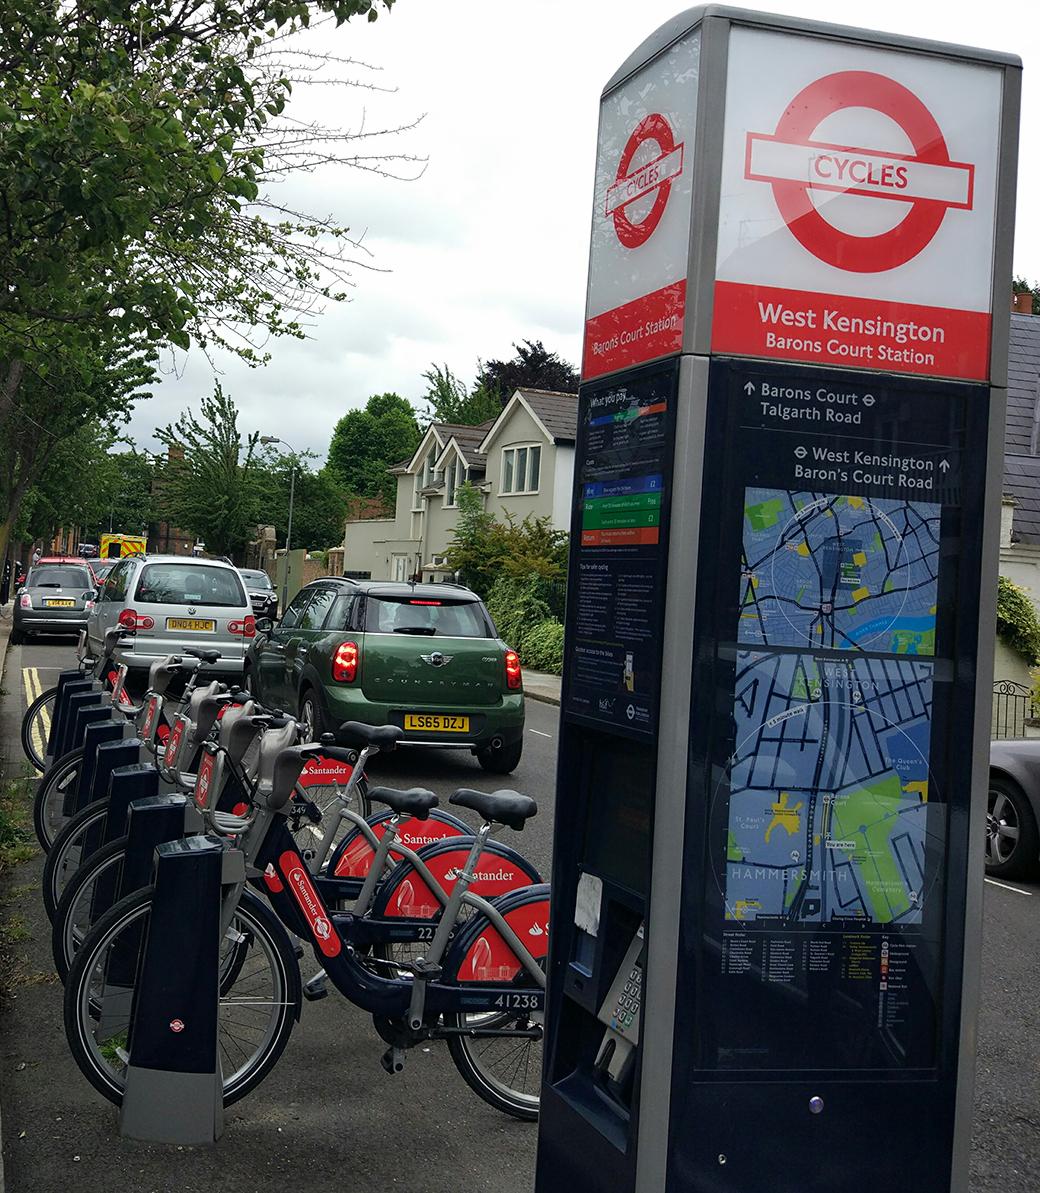 alquiler de bicicletas en Londres